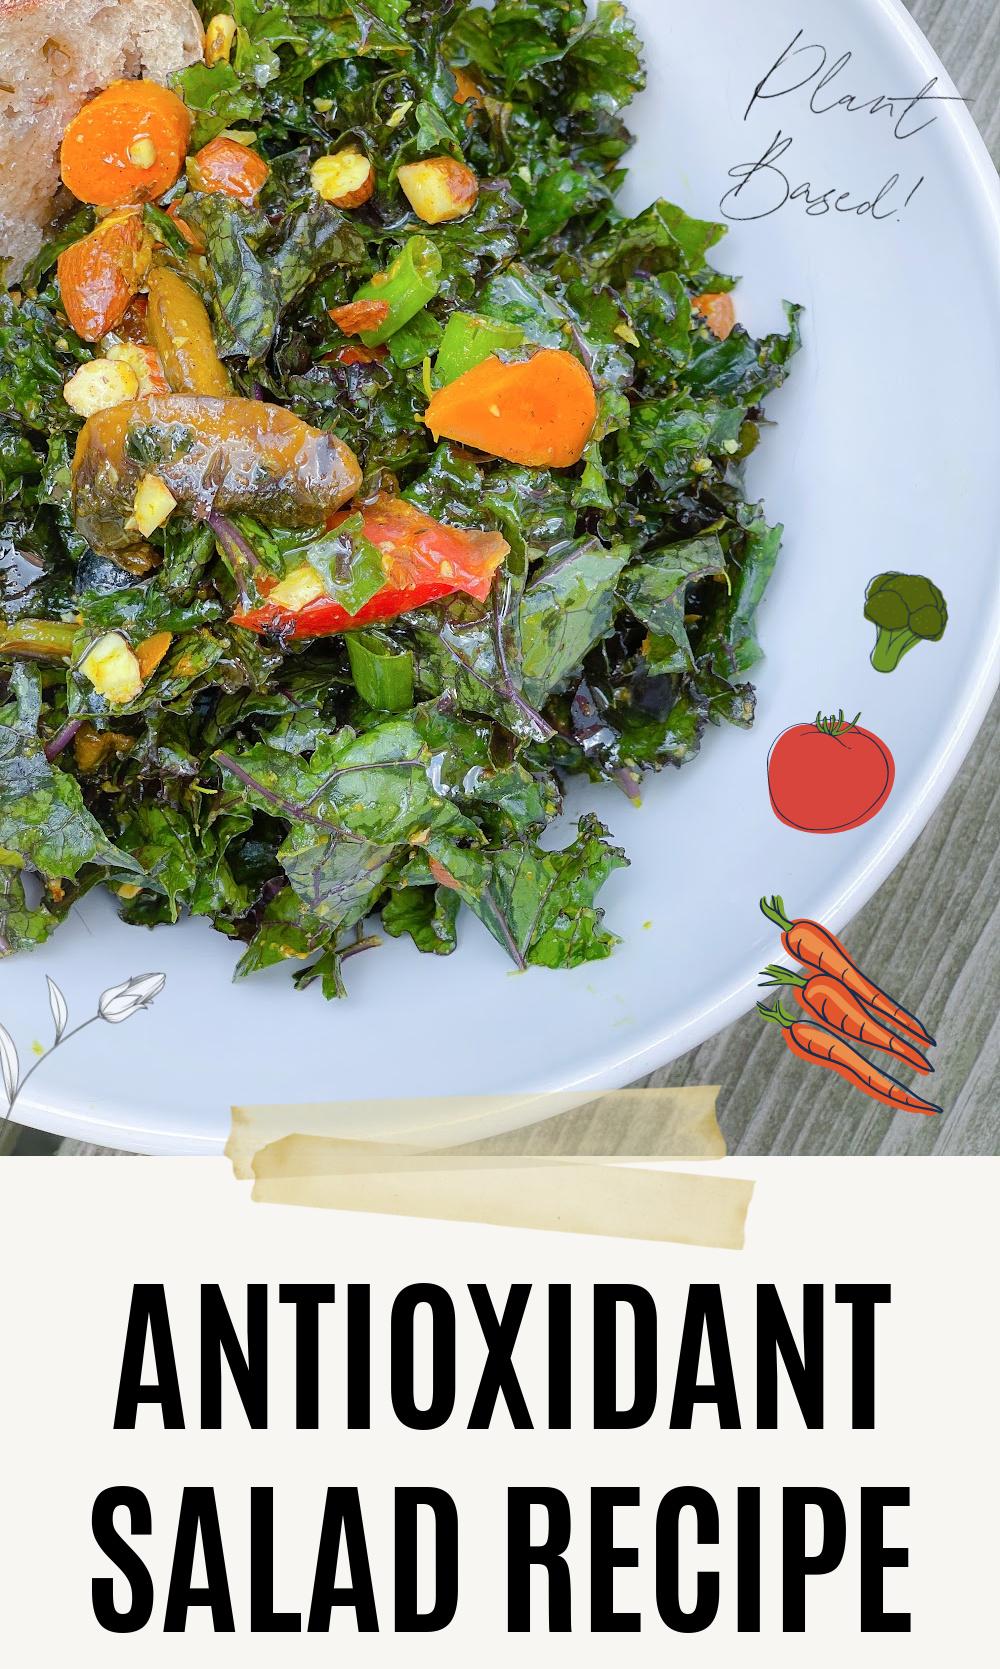 Antioxidant Salad Recipe I DreaminLace.com #plantbased #plantbasedrecipes